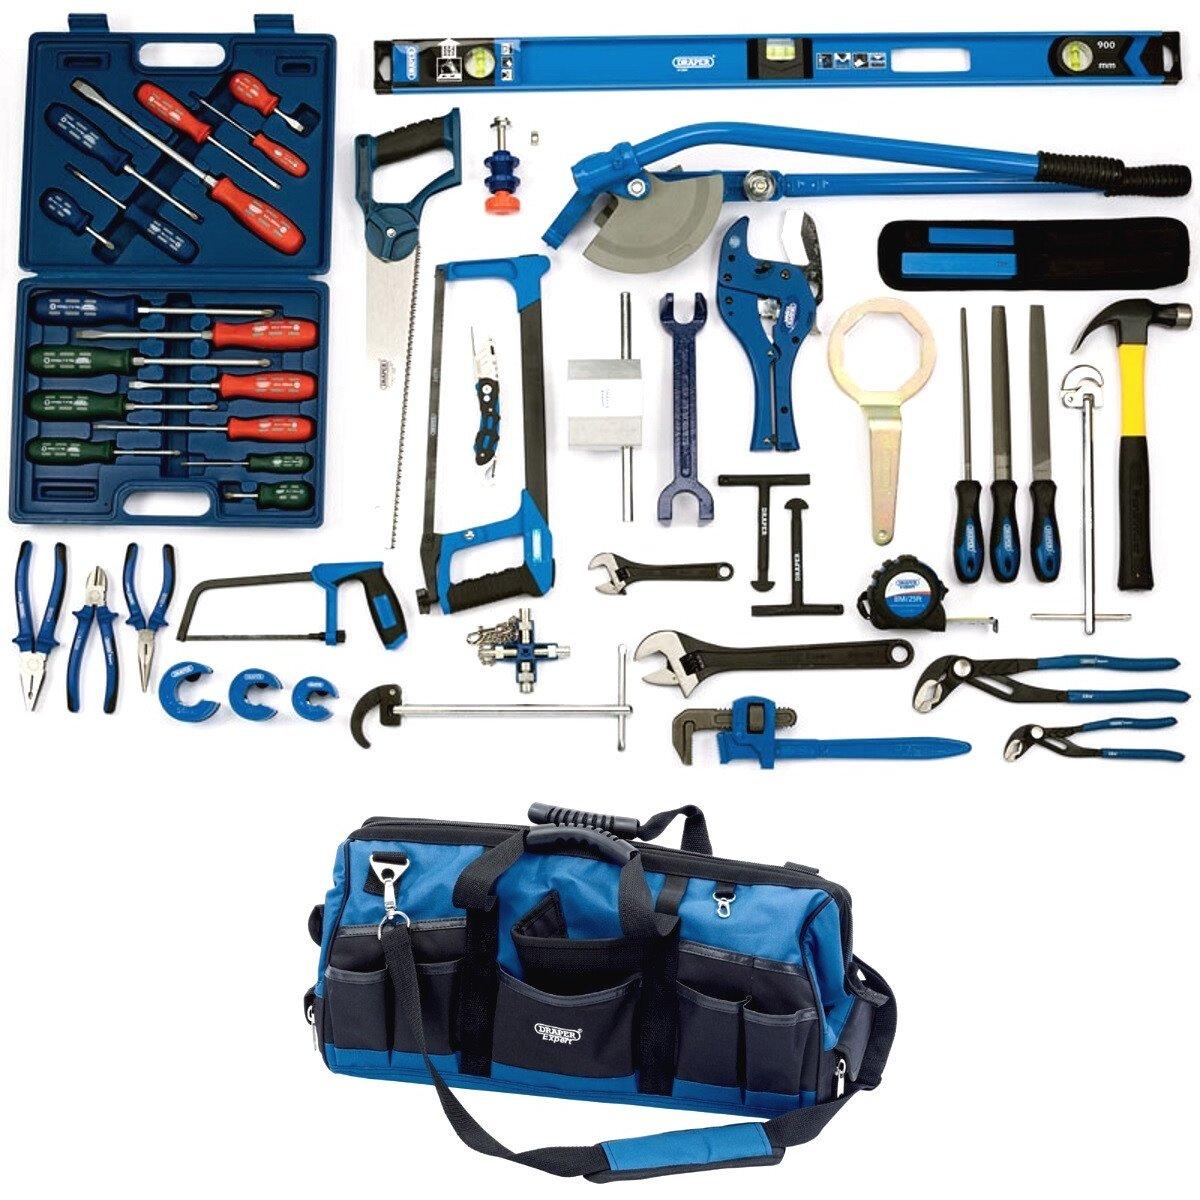 Draper 04380 *PLUMBTK Plumbing Tool Kit